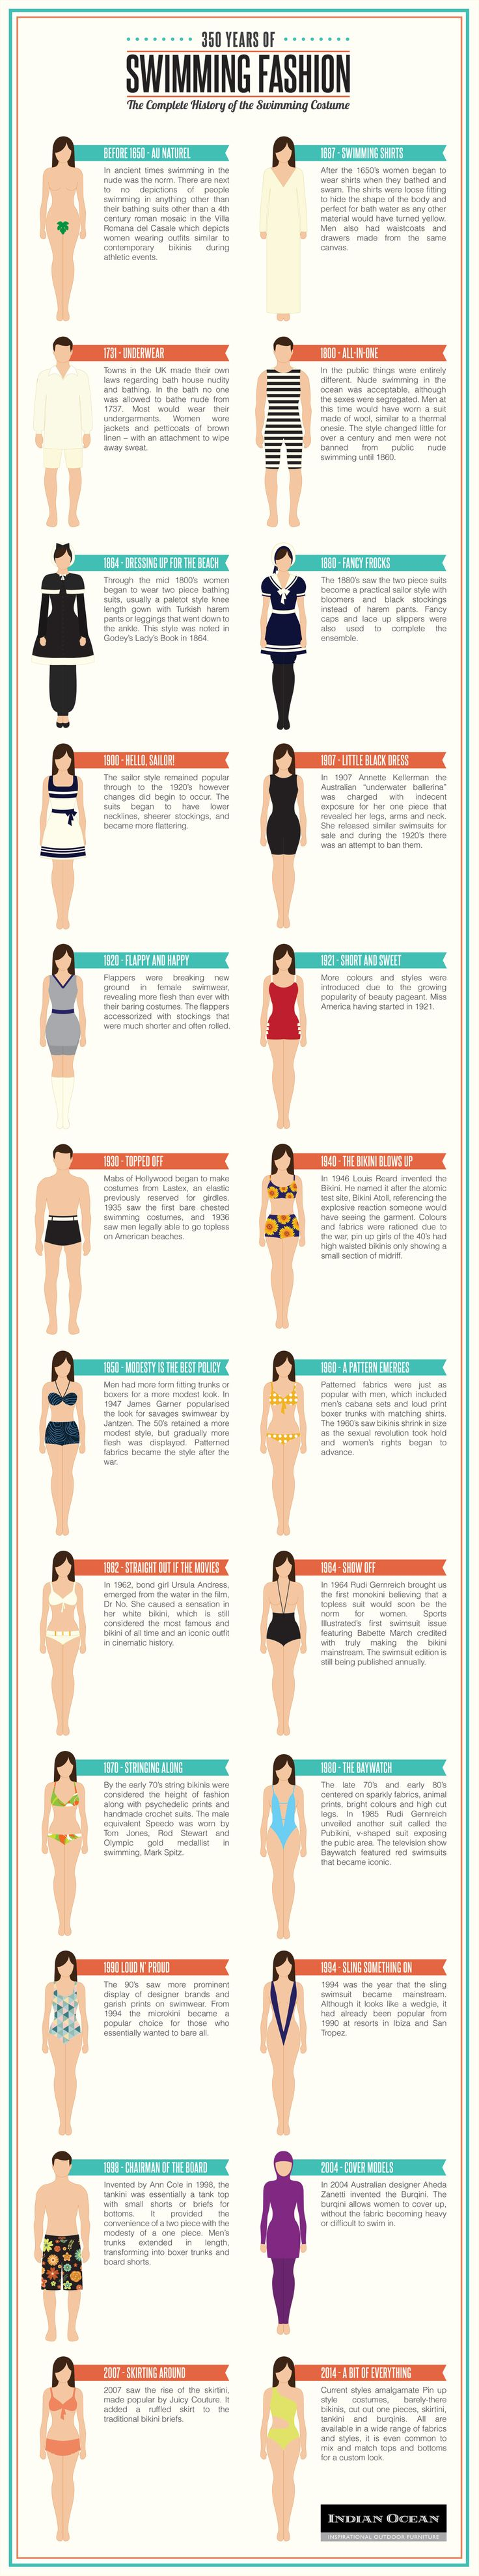 350 Years of Swimming Fashion #infographic #Swimming #fashion